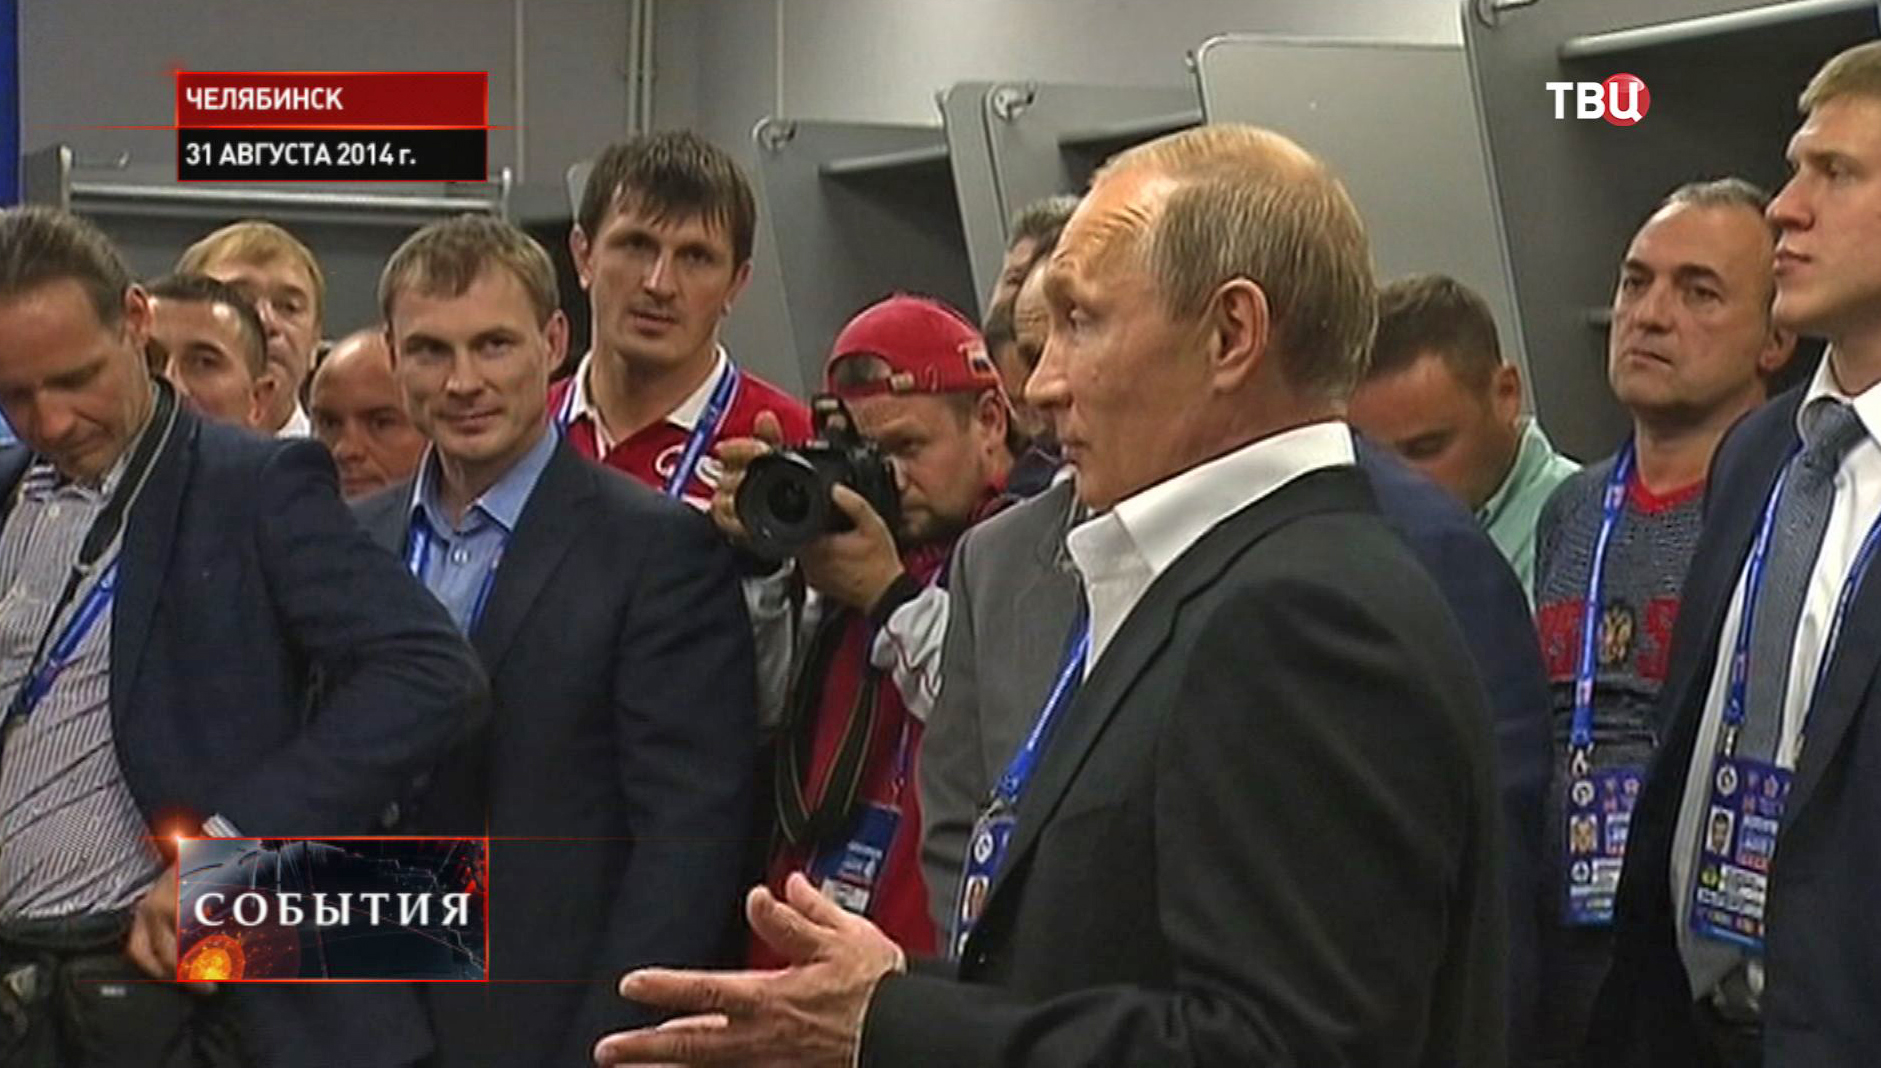 Президент РФ Владимир Путин во время церемонии закрытия чемпионата мира по дзюдо-2014